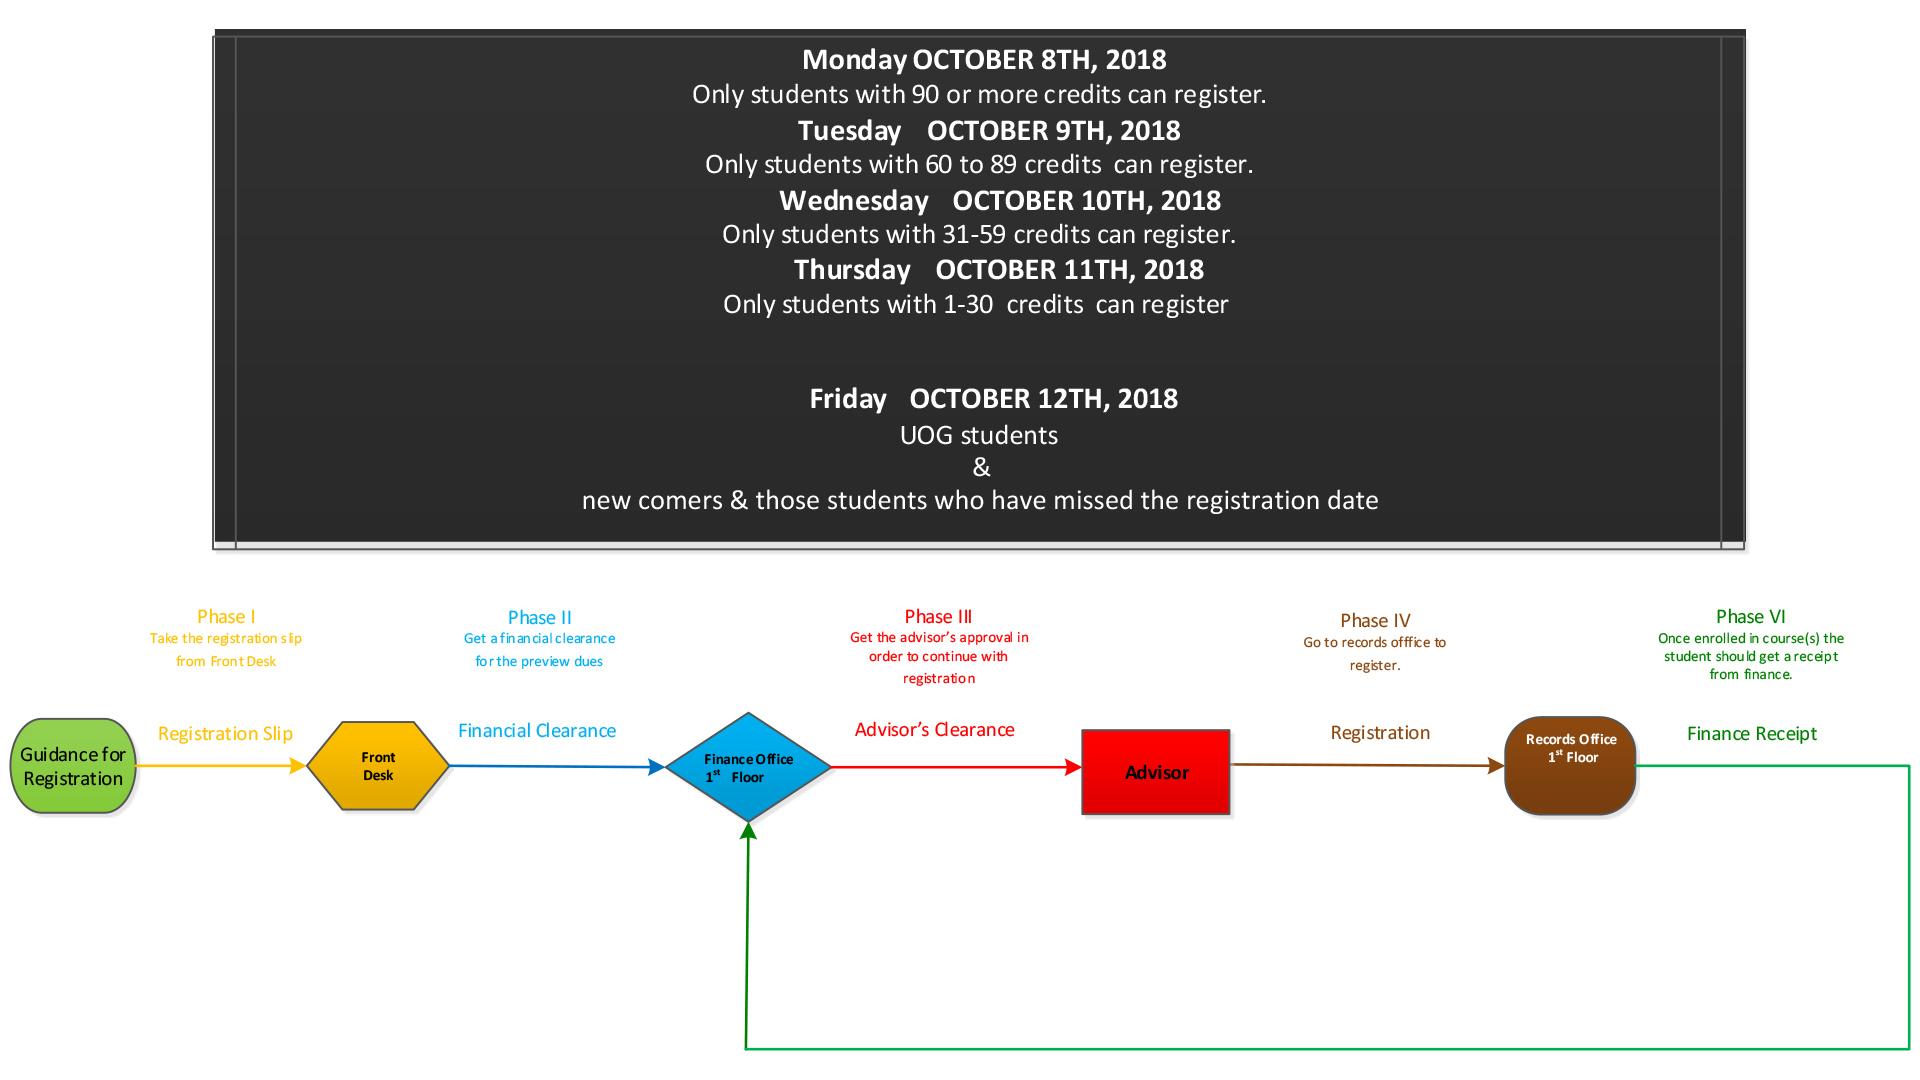 Registration Scheme FALL 2018